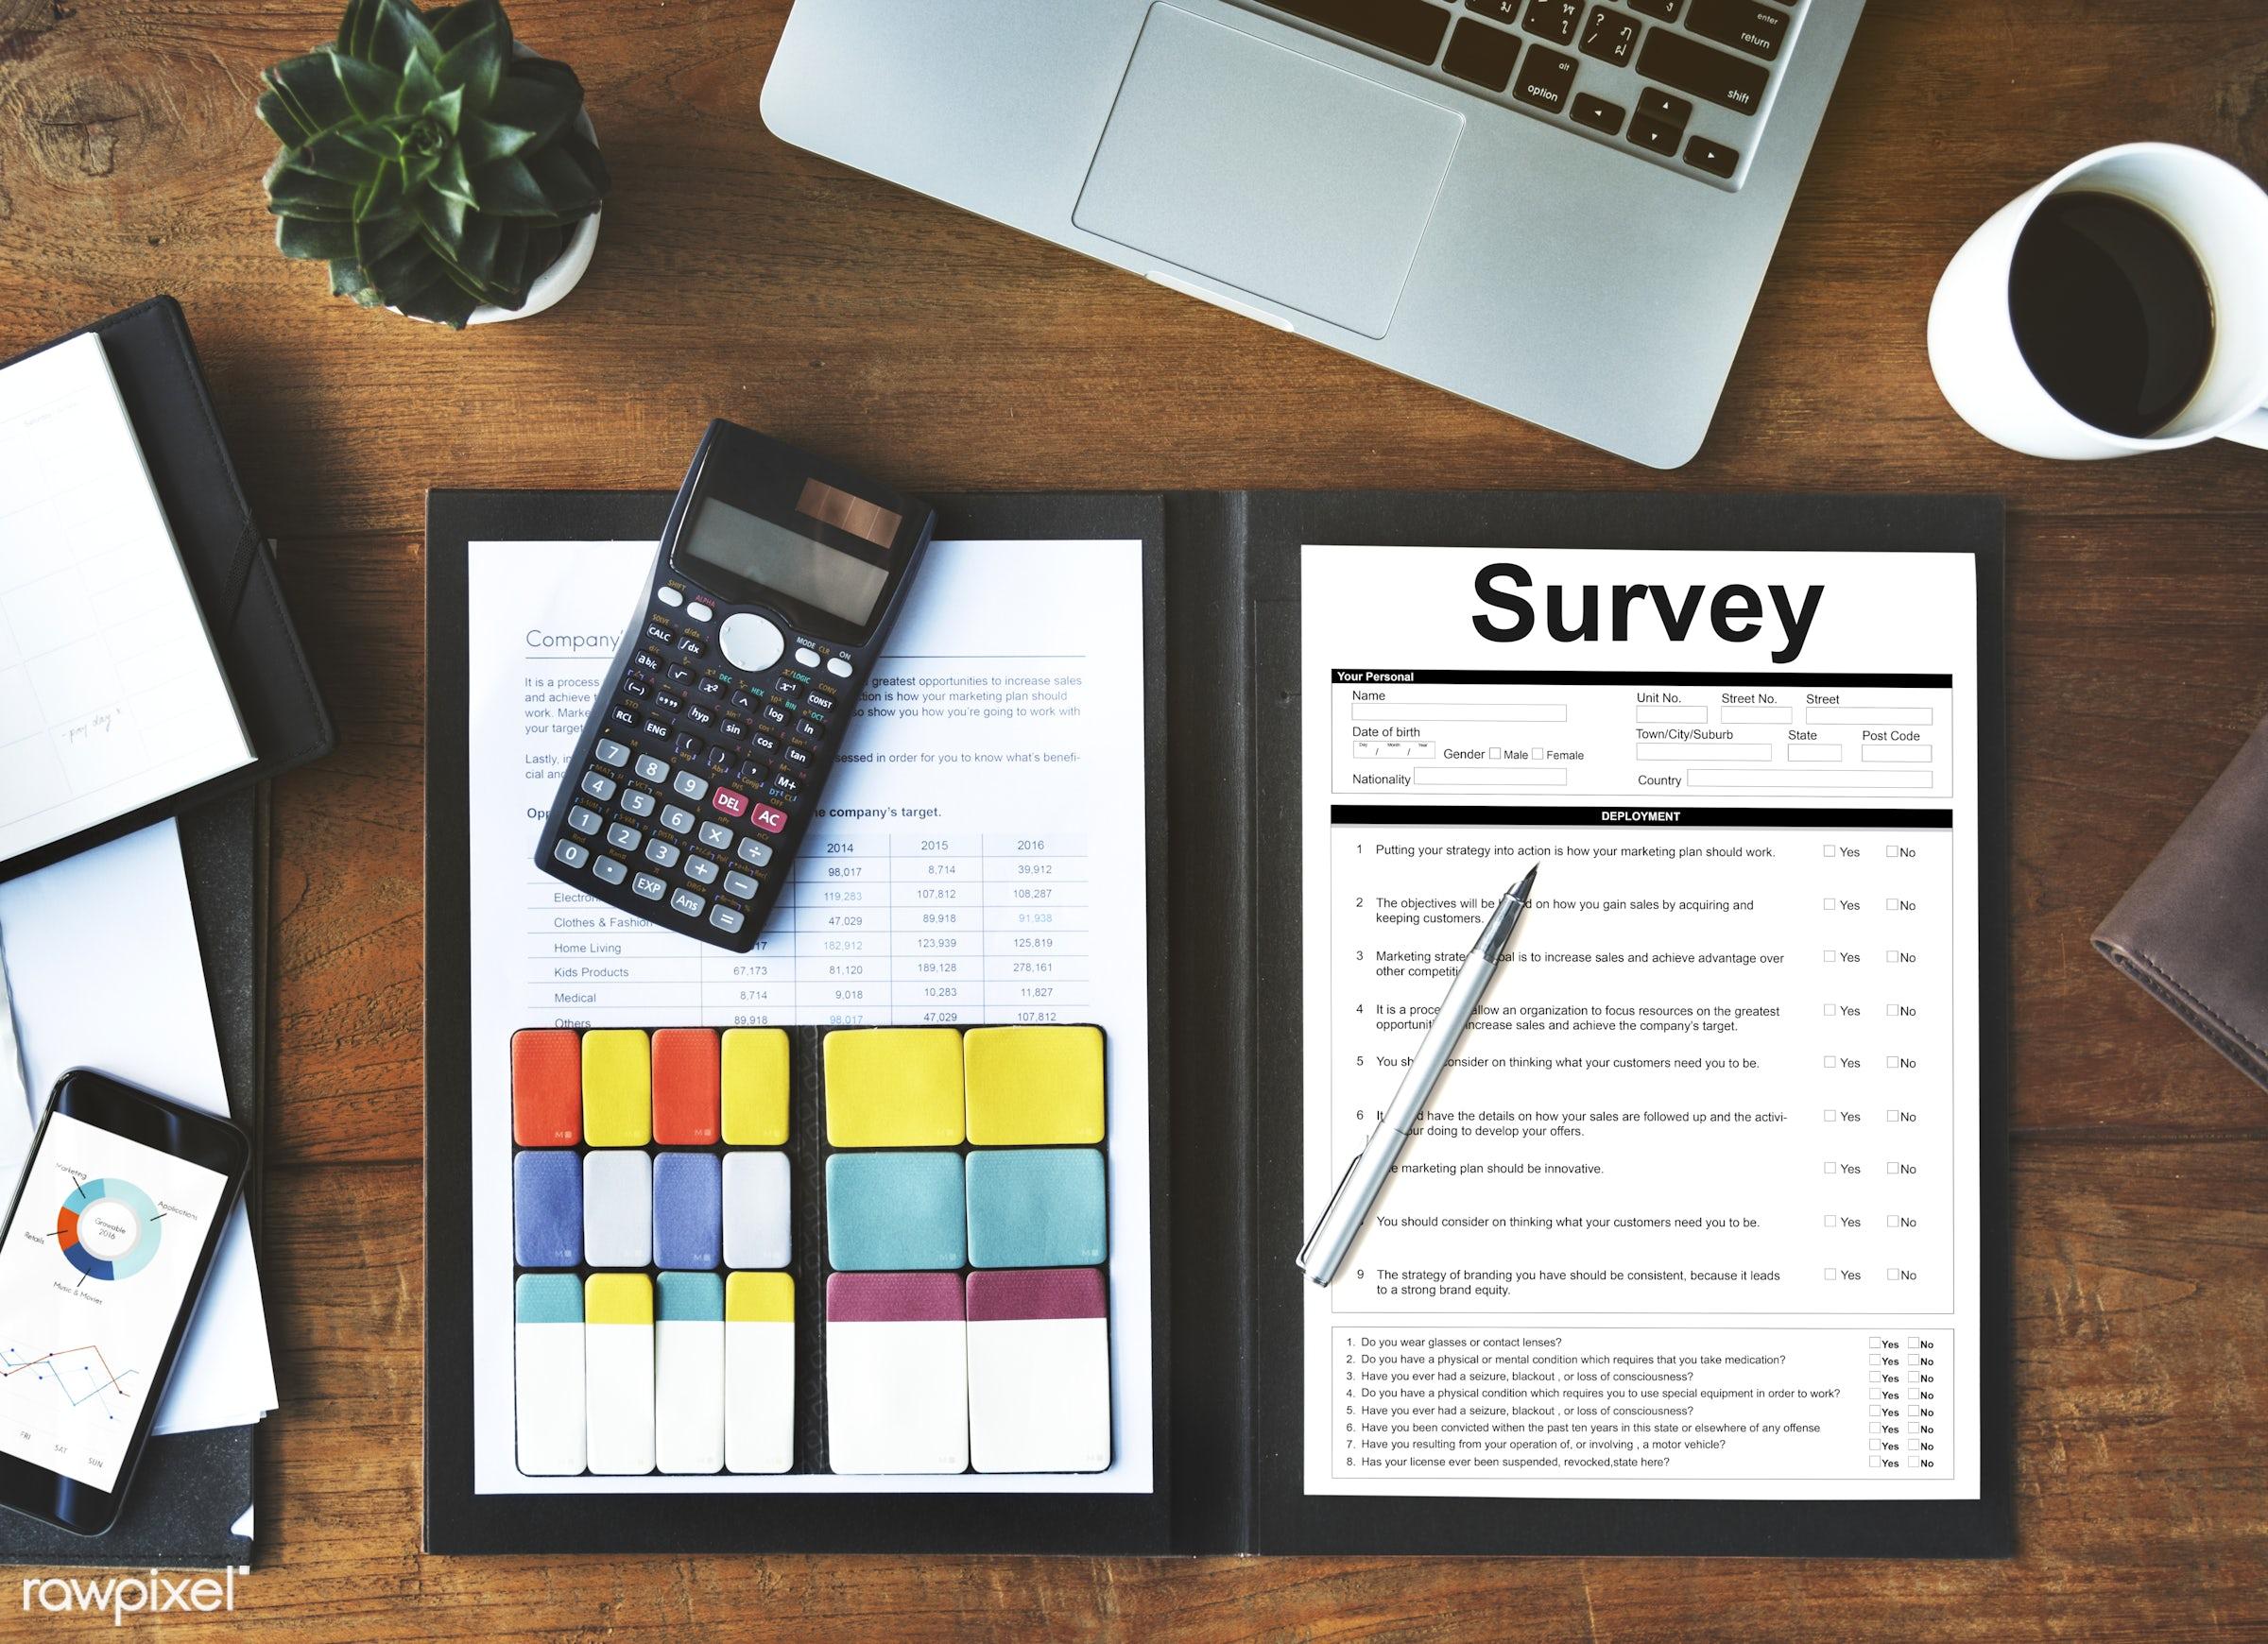 survey, feedback, accountant, aerial view, business, calculator, check, checklist, choice, coffee, computation, computer,...